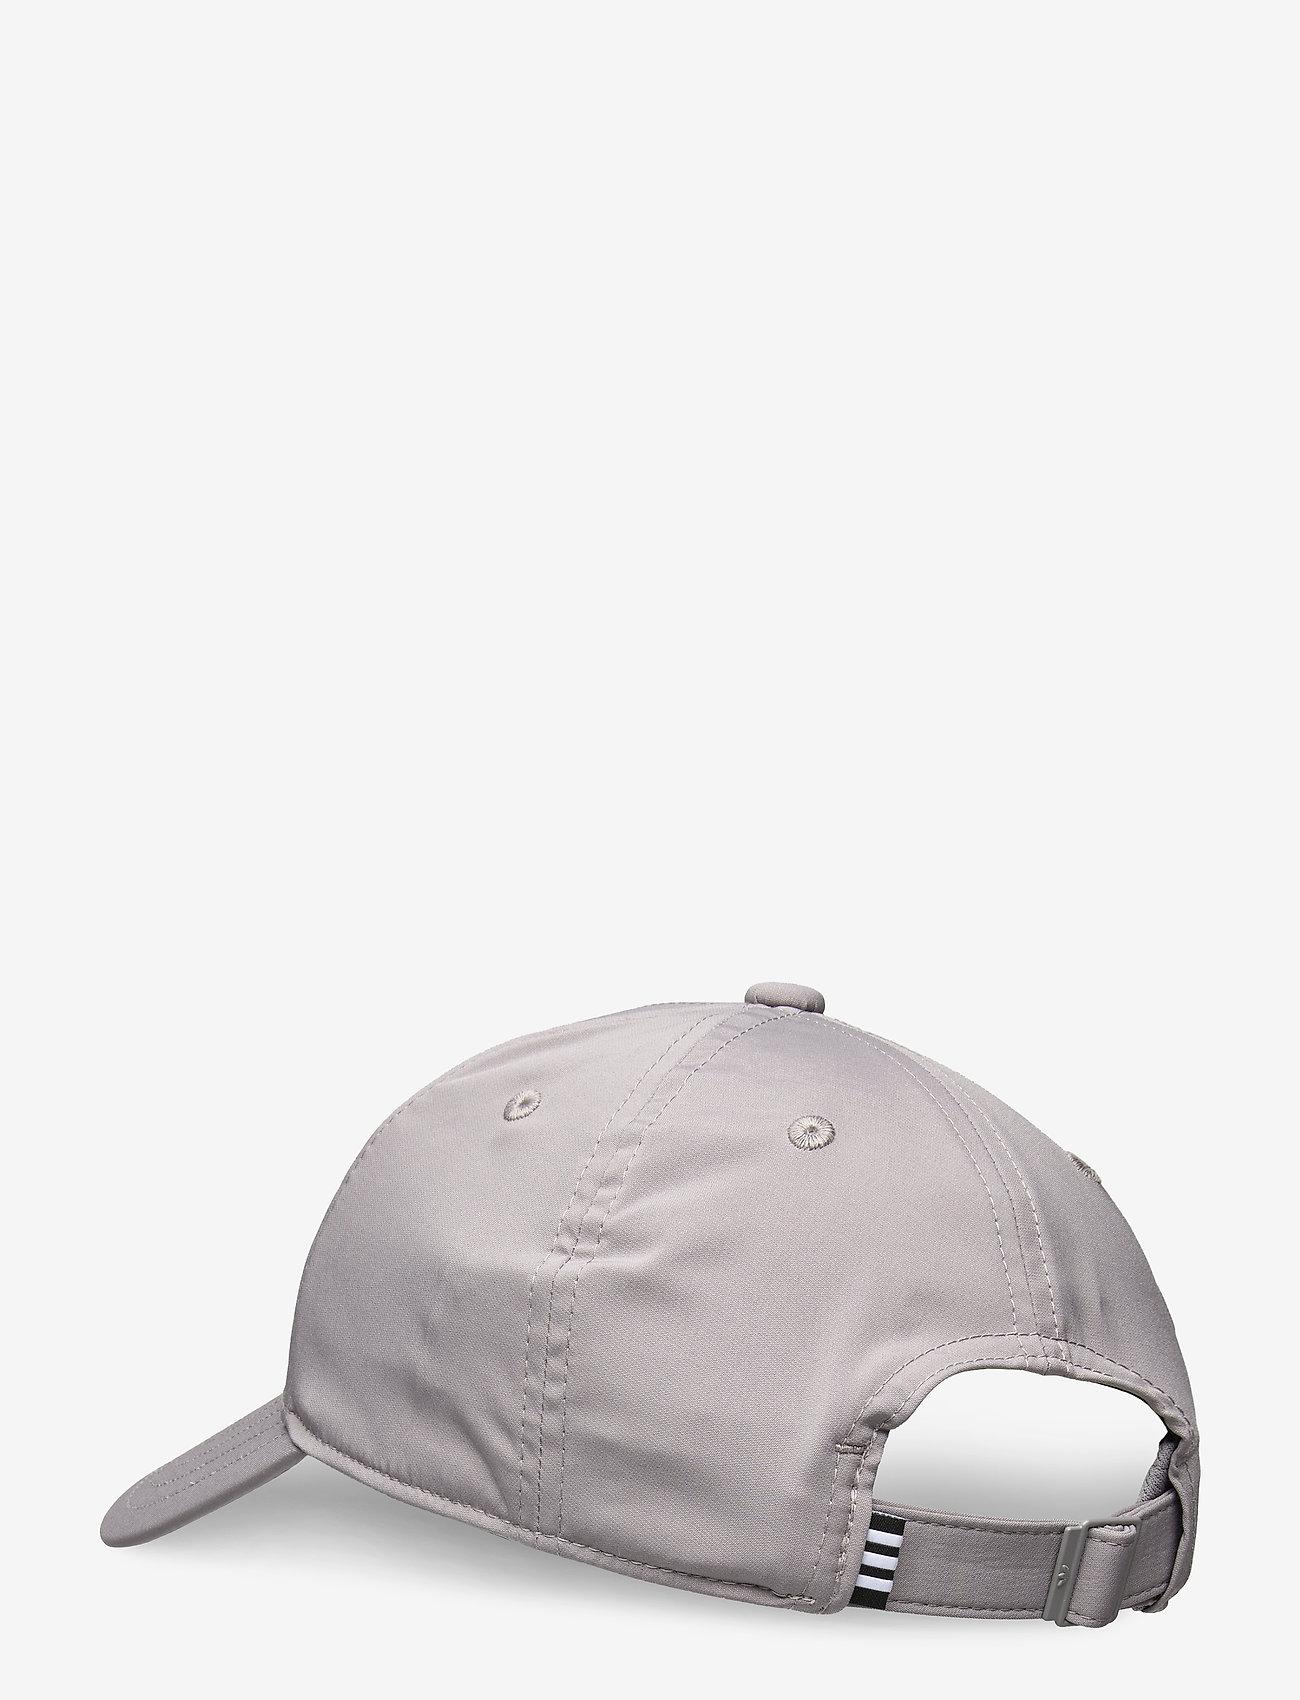 adidas Originals - BBALL - caps - dovgry - 1